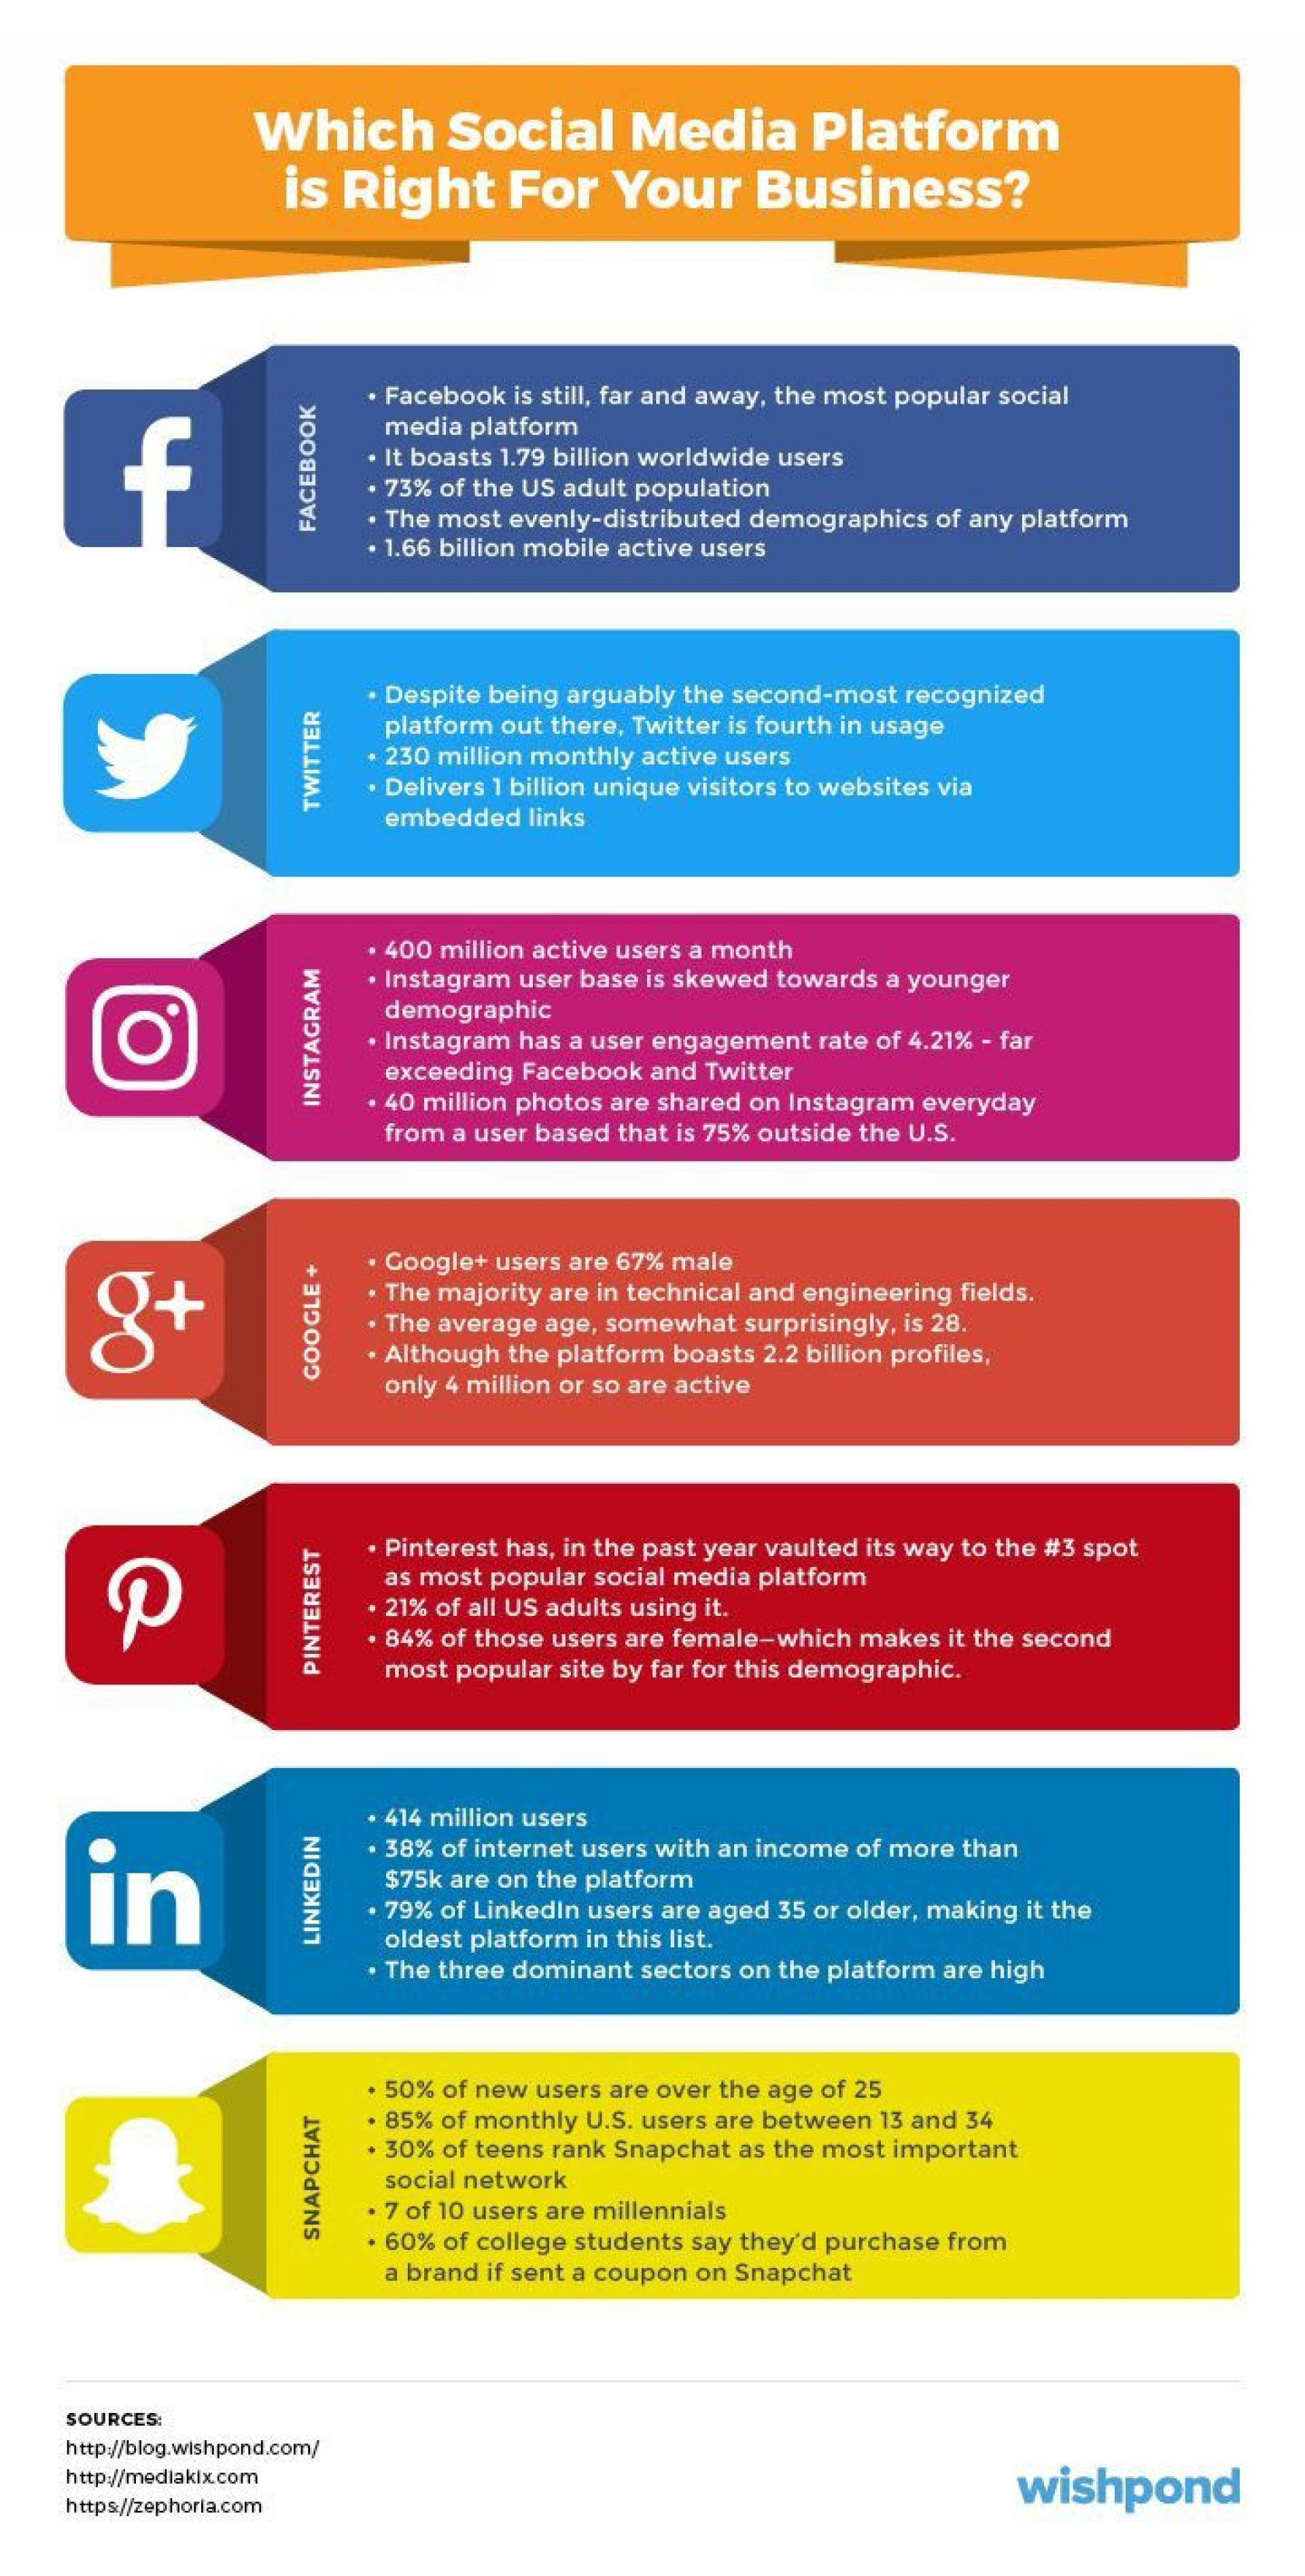 002 Stunning Social Media Plan Example Pdf Photo  Template Marketing Sample1920